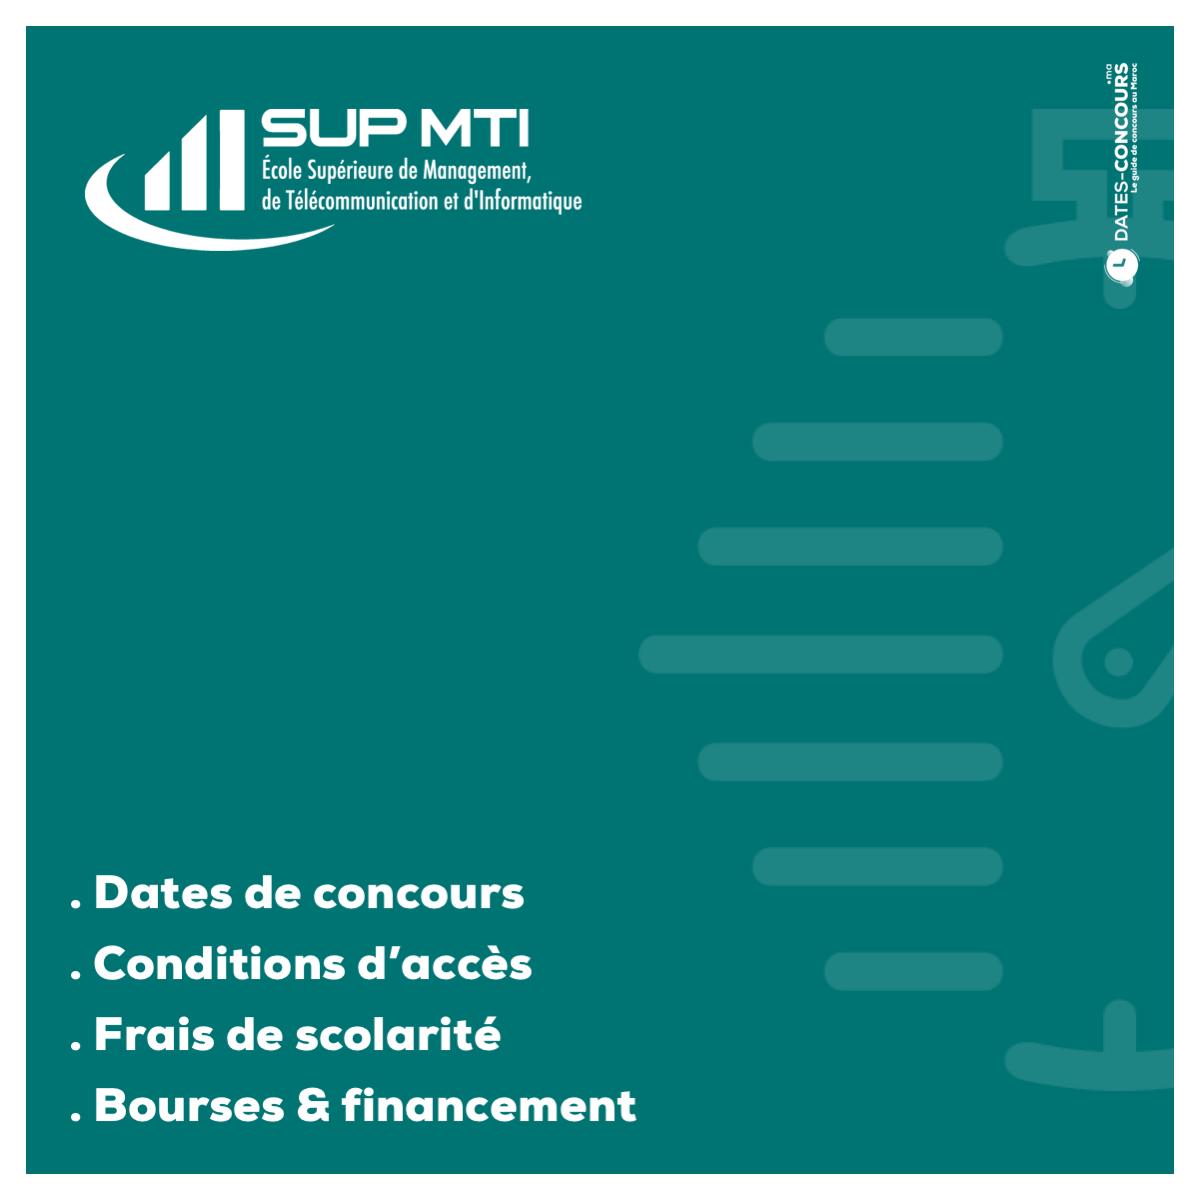 SUP MTI - Dates-concours.ma